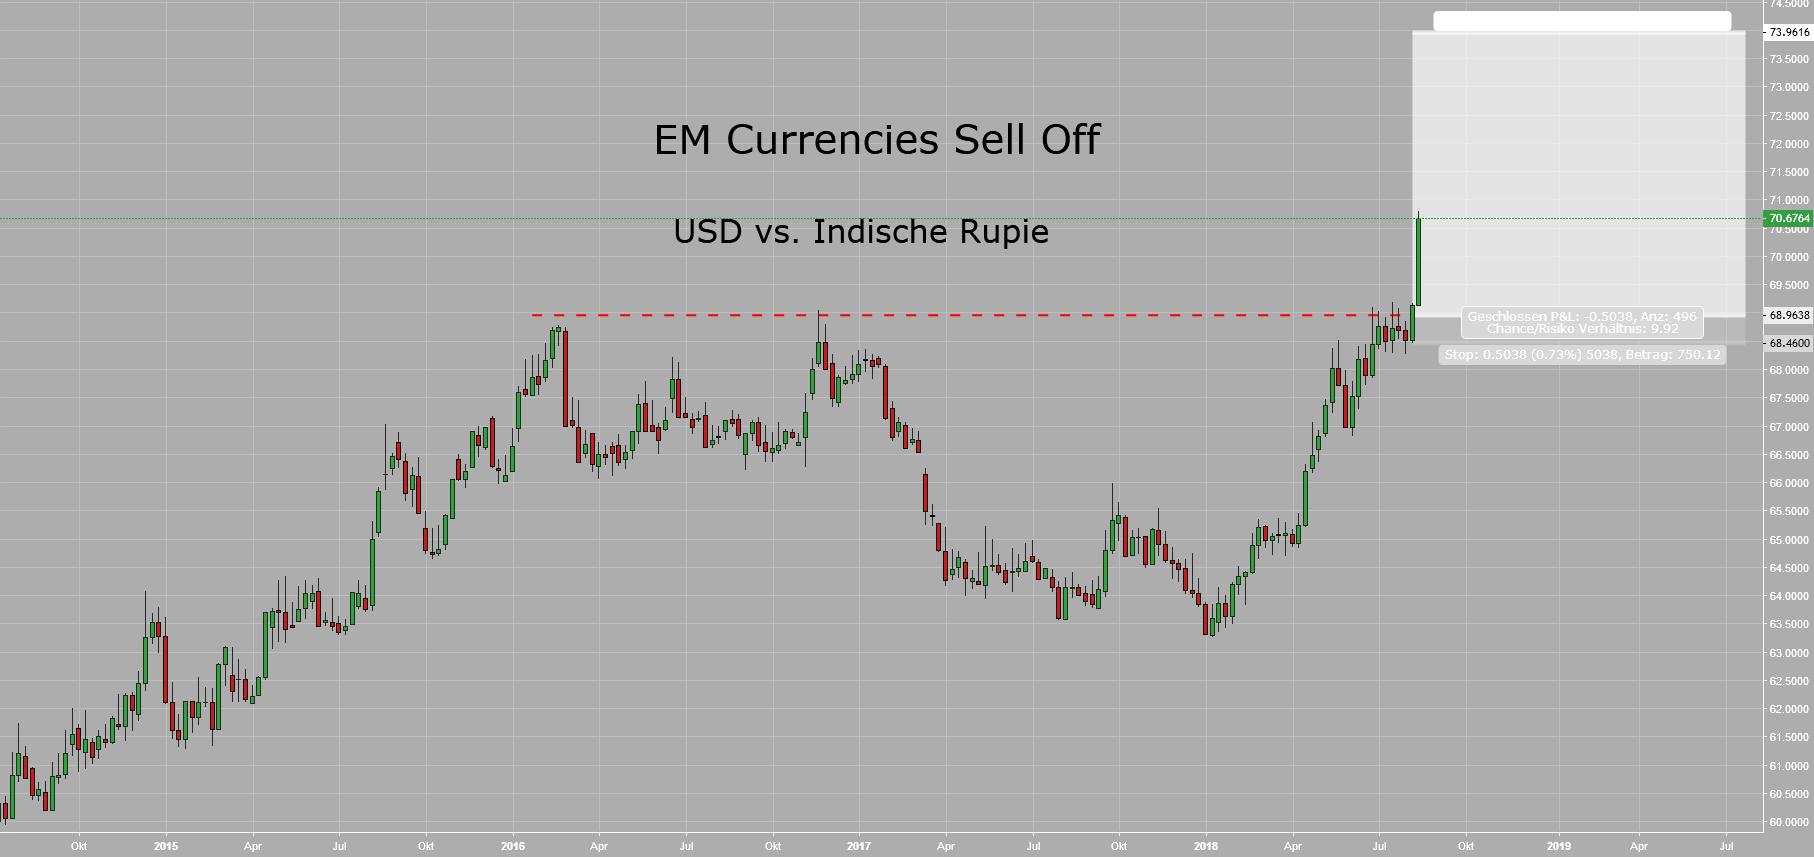 EM Currencies Sell Off - Asien I: USDINR